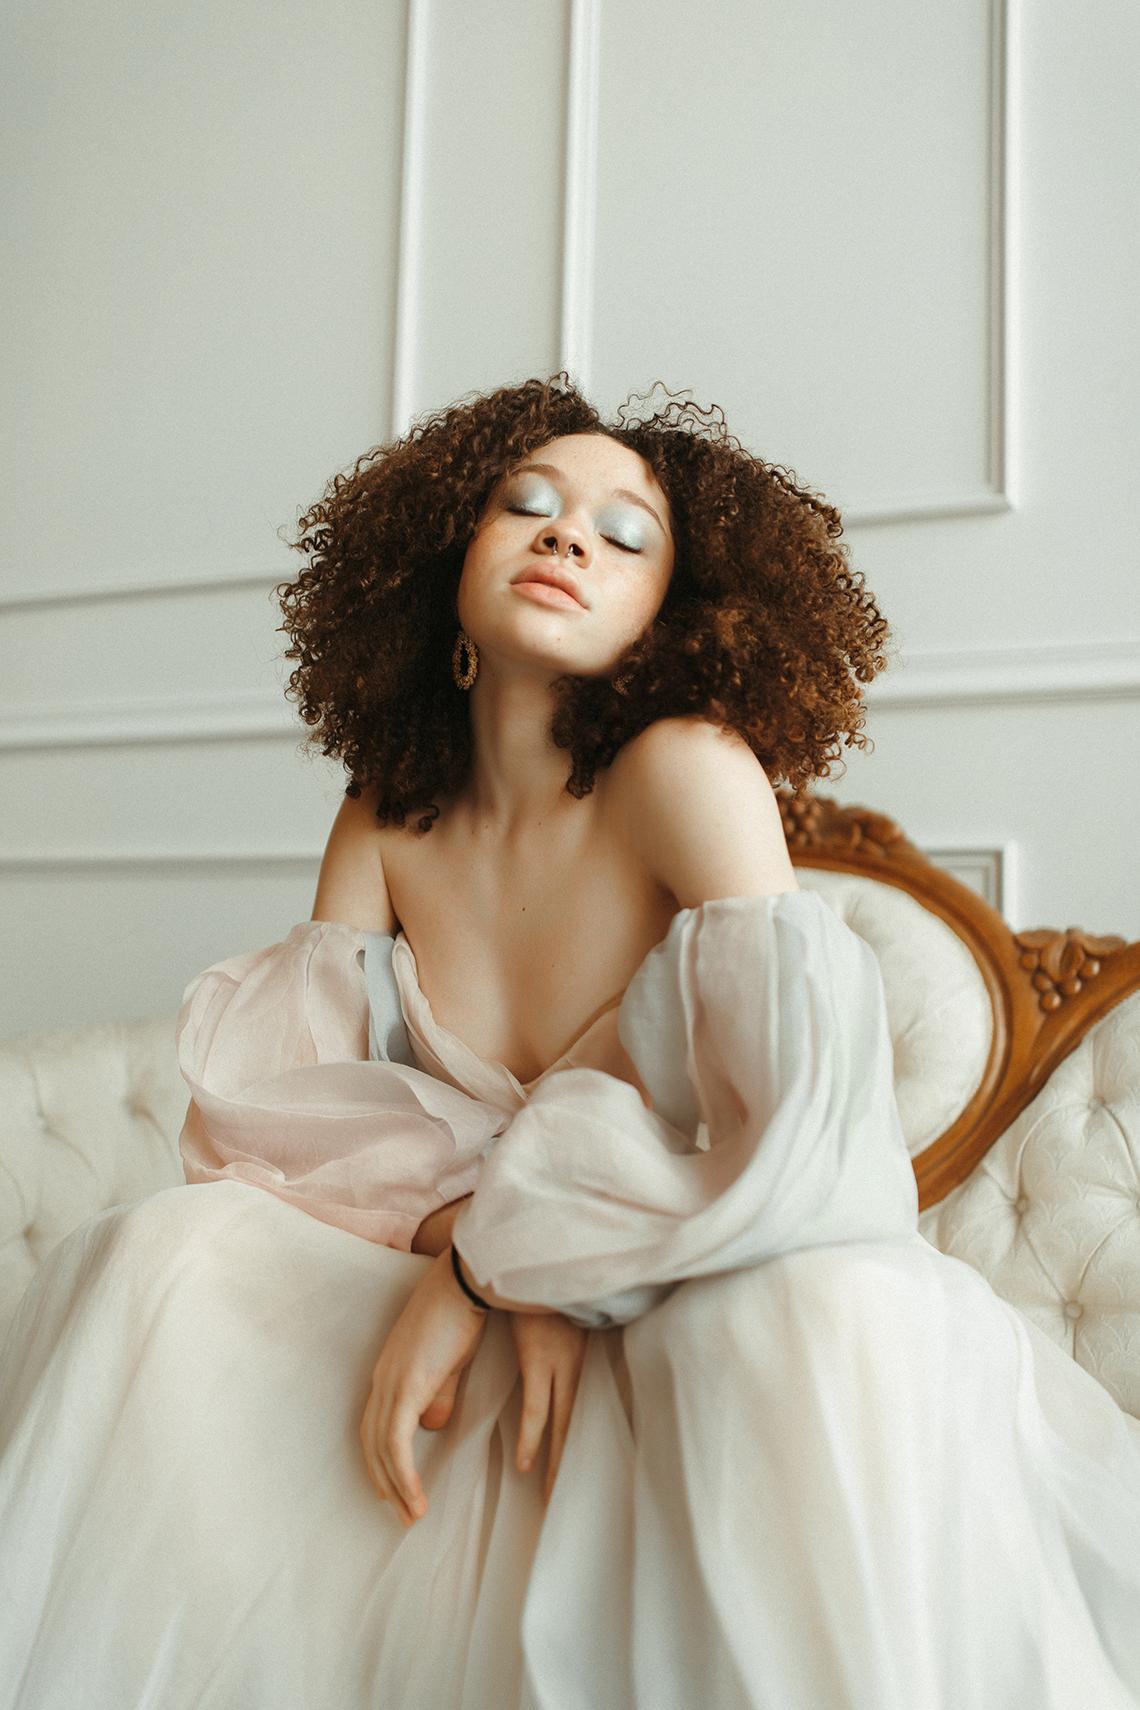 Cool Anti Bride Wedding Inspiration with Colorful Wedding Dresses – Naba Zabih – Claire La Faye – Bridal Musings 14